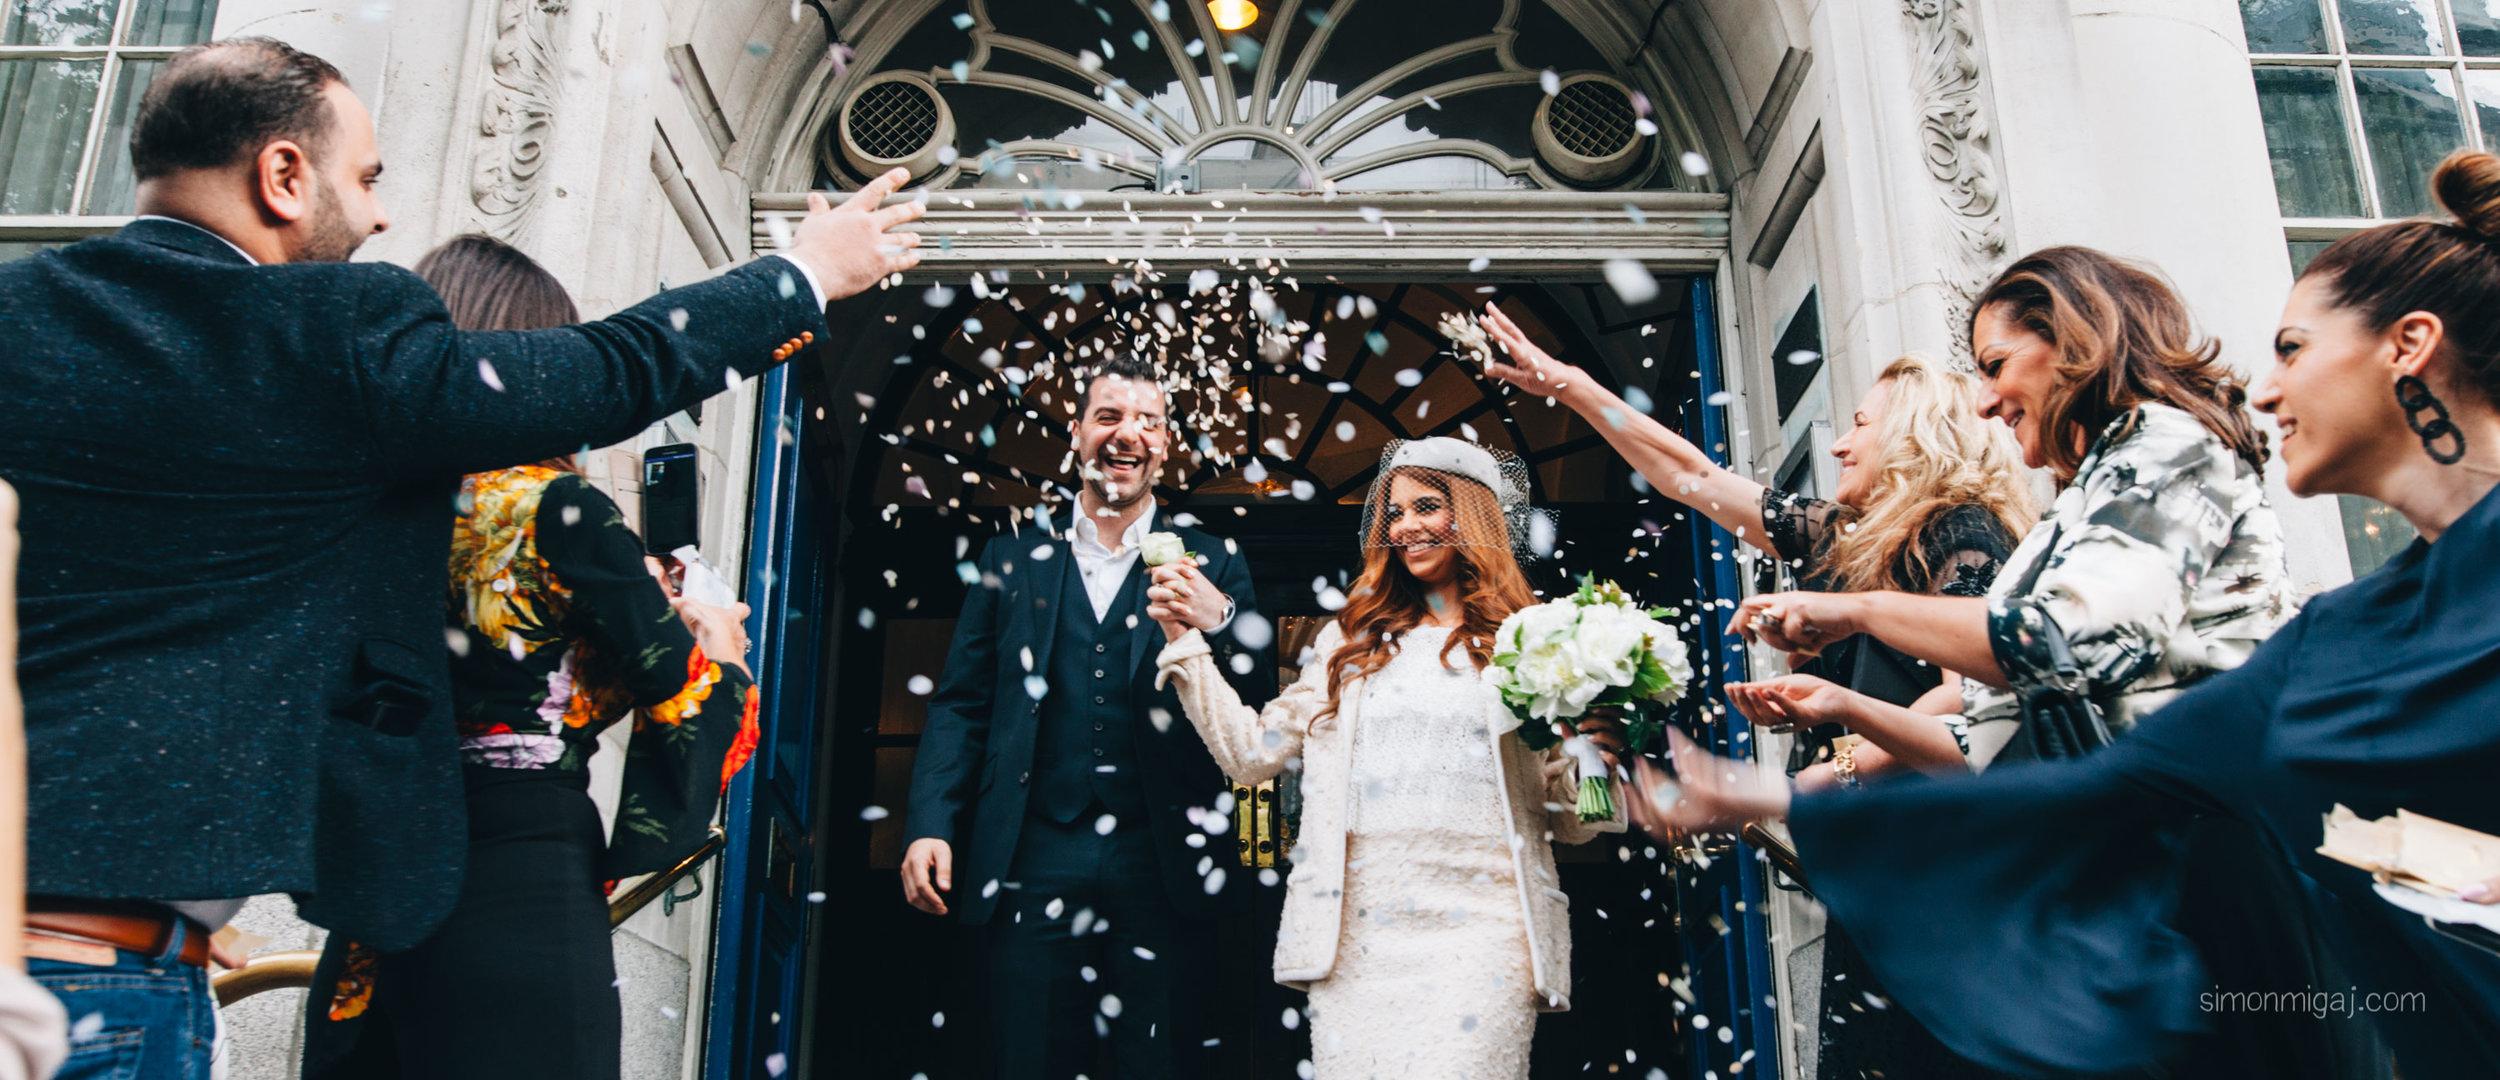 WeddingPhotography_AgathaStavros-2.jpg